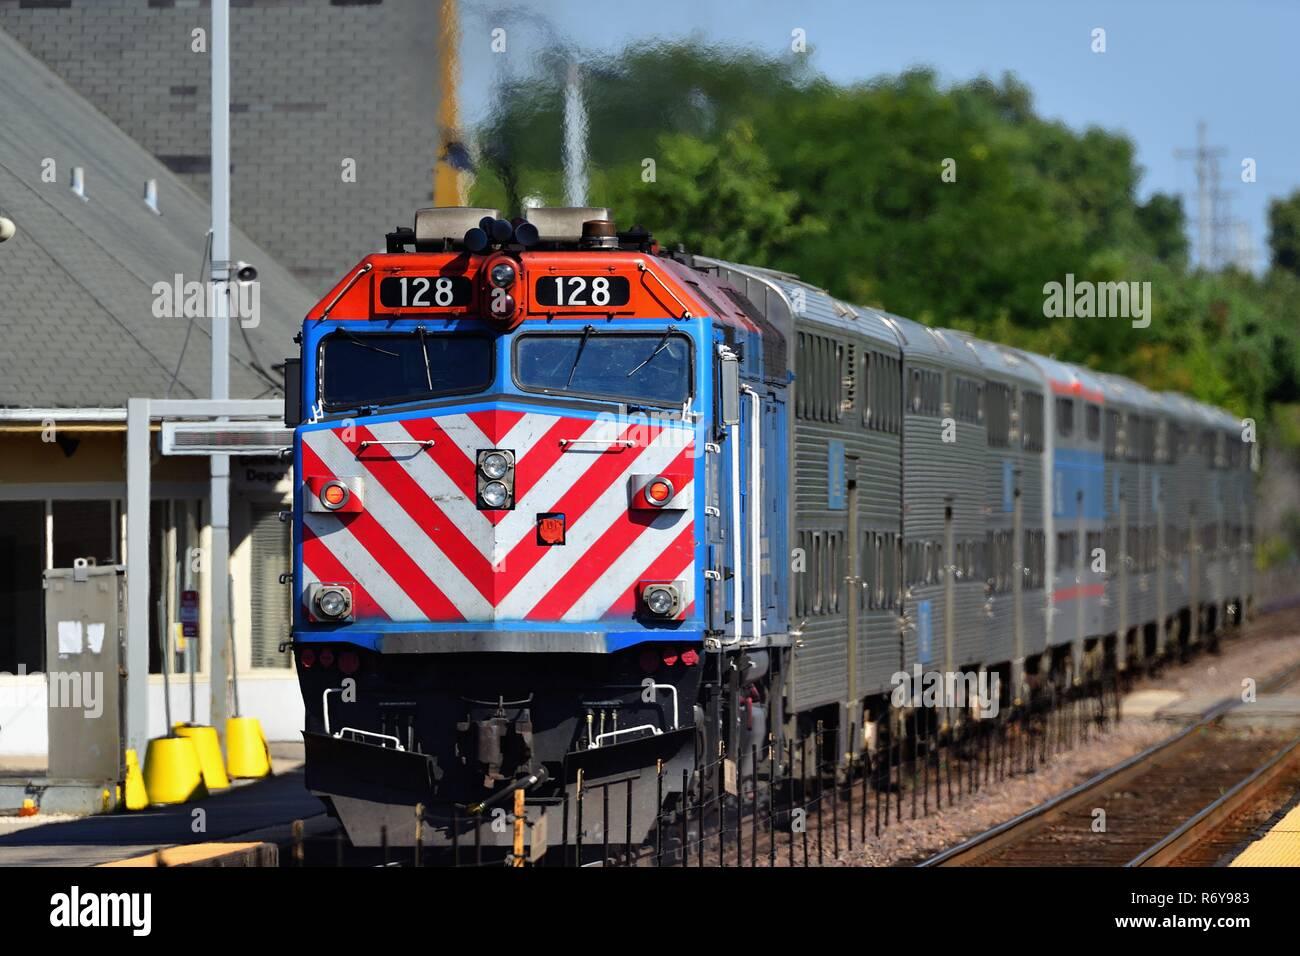 Geneva, Illinois, USA. An inbound Metra commuter train destinved for Chicago departing the Geneva, Illinois station. - Stock Image